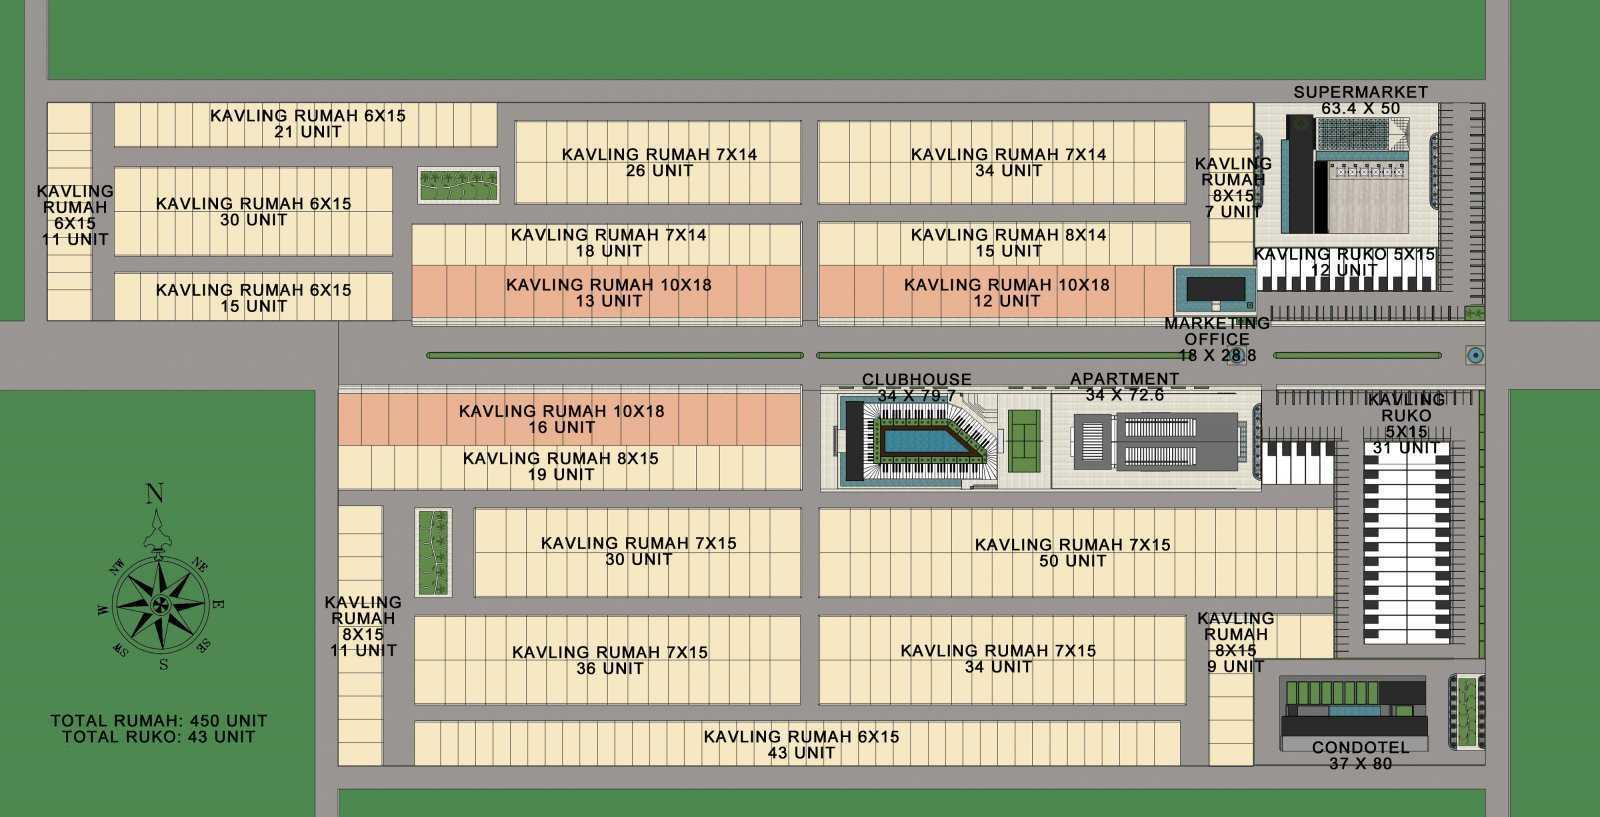 Aeternite Timika Development Masterplan Timika, Mimika Baru, Kabupaten Mimika, Papua, Indonesia Timika, Mimika Baru, Kabupaten Mimika, Papua, Indonesia Aeternite-Timika-Development-Masterplan   56502